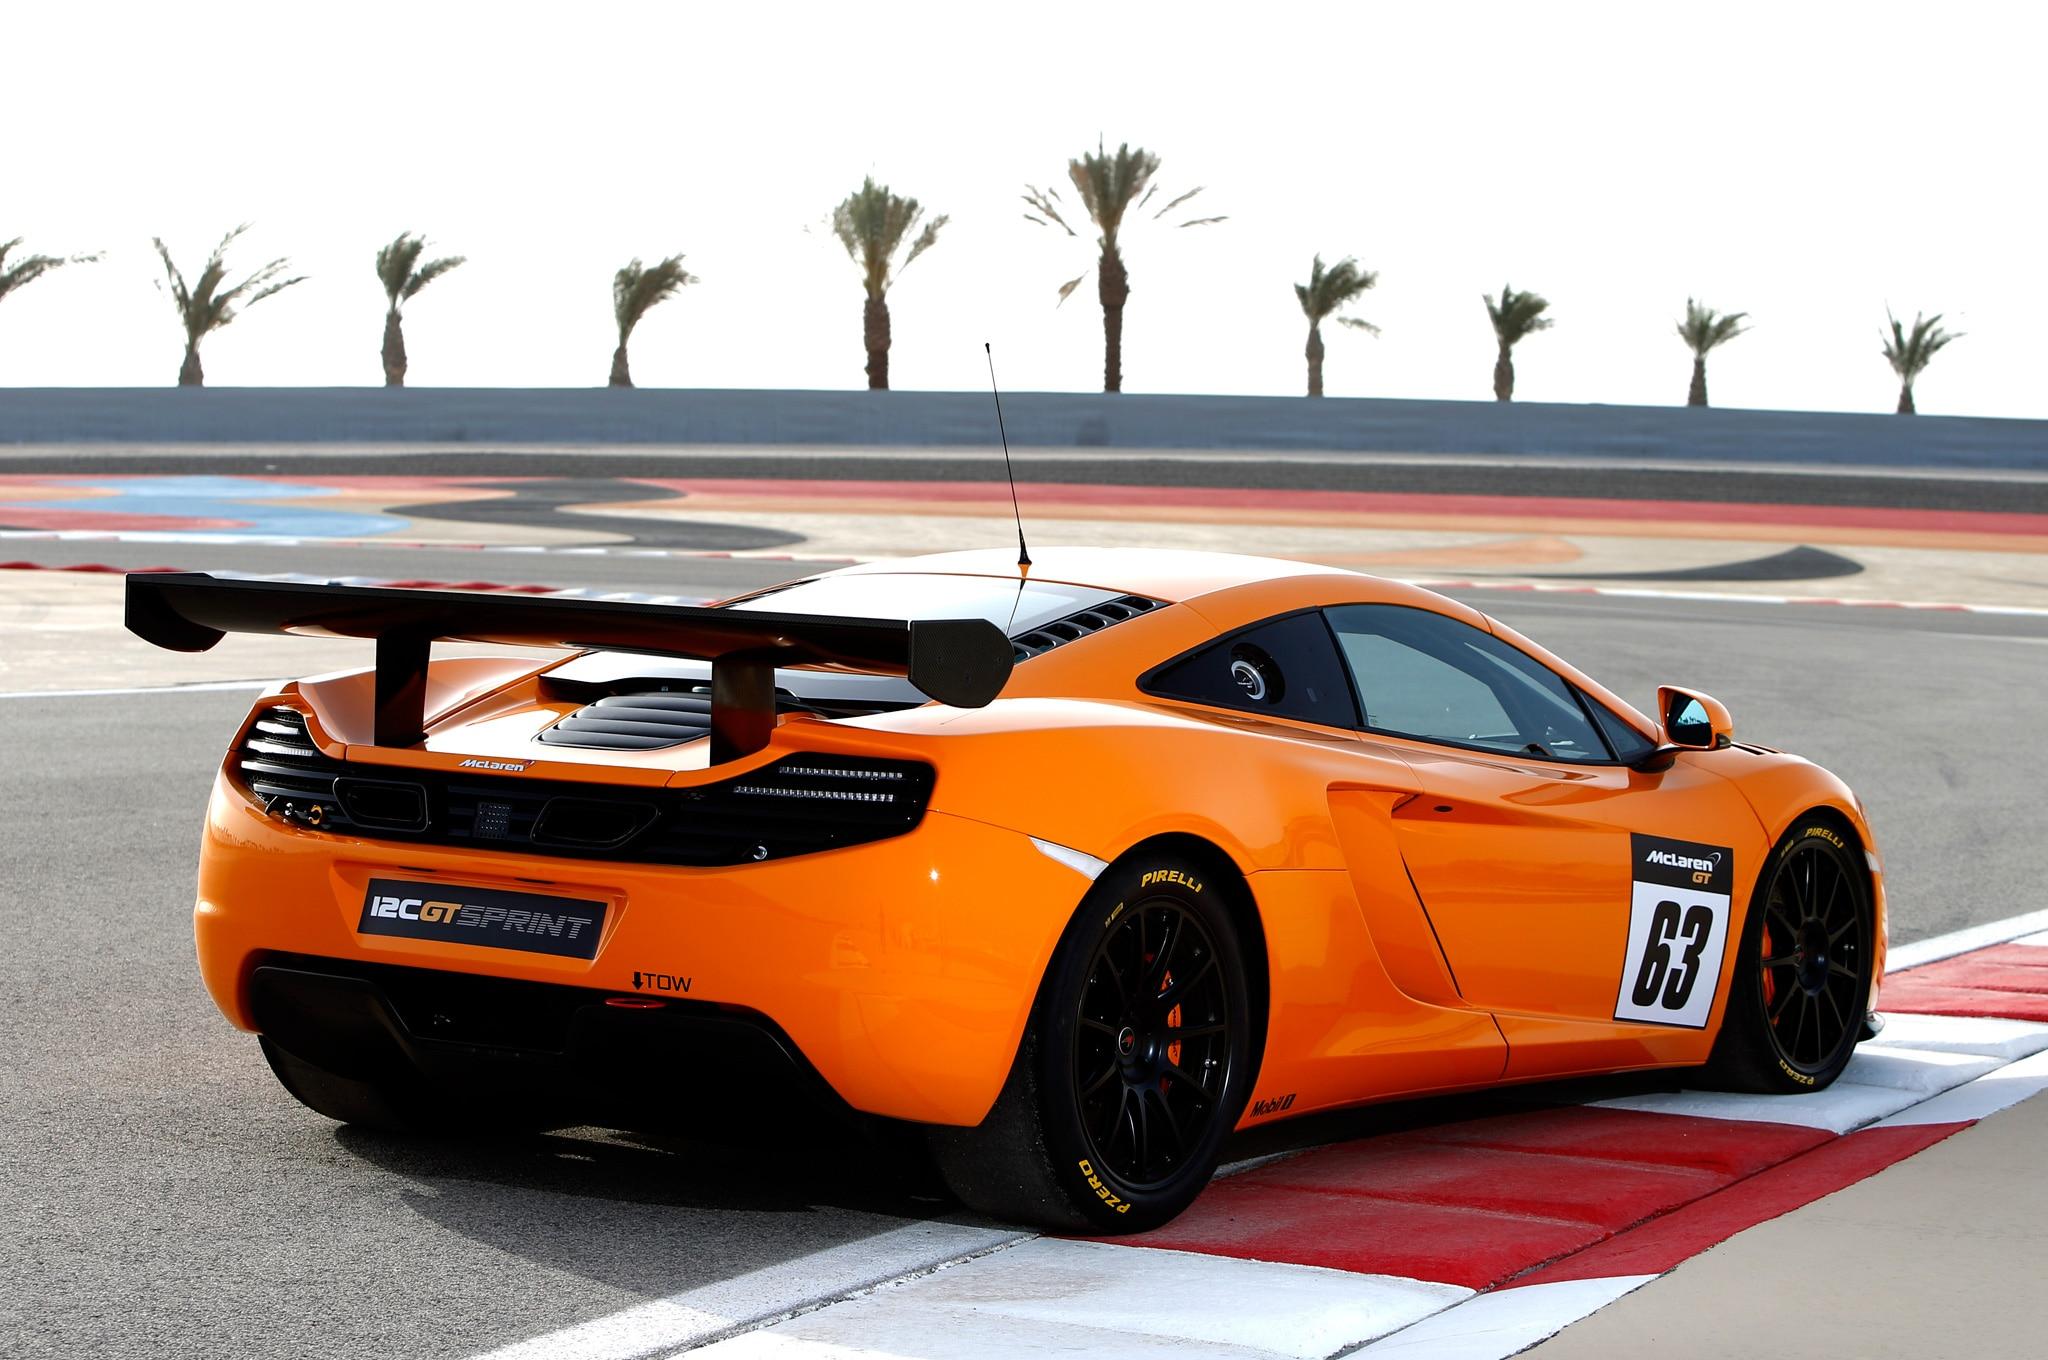 2014 McLaren 12C GT Sprint Rear Three Quarter1